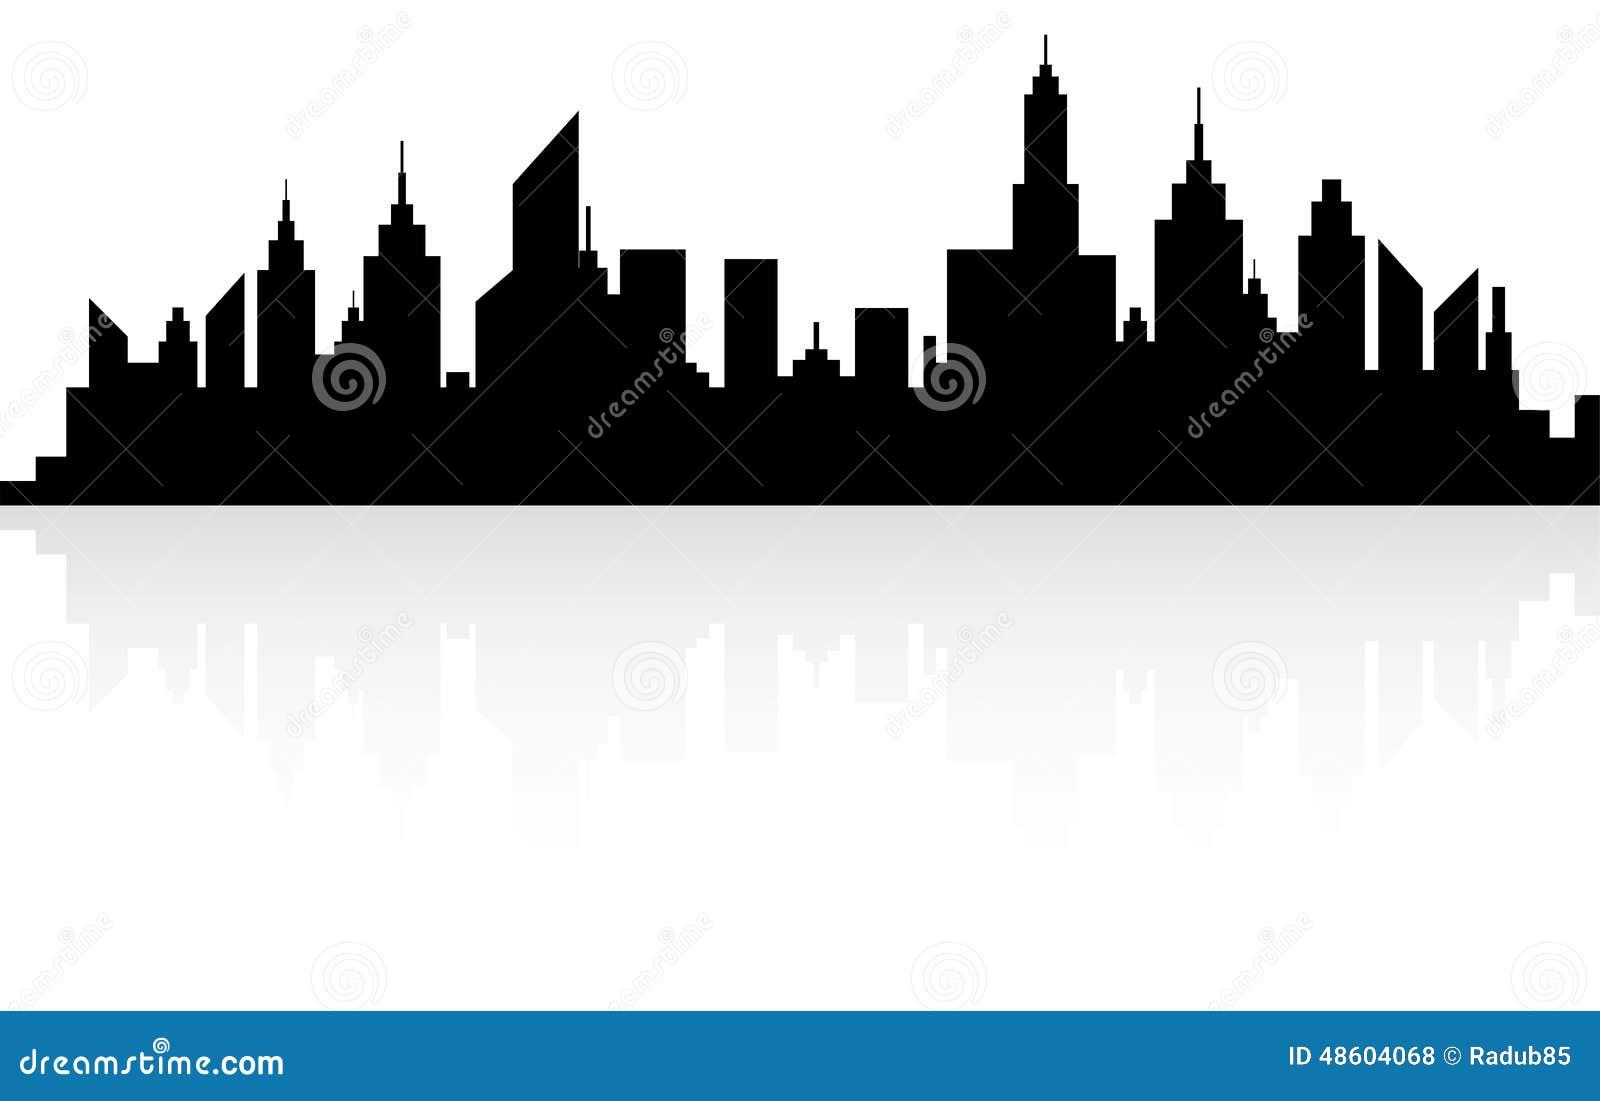 Modern City Skyscrapers Skyline Silhouette Stock Vector